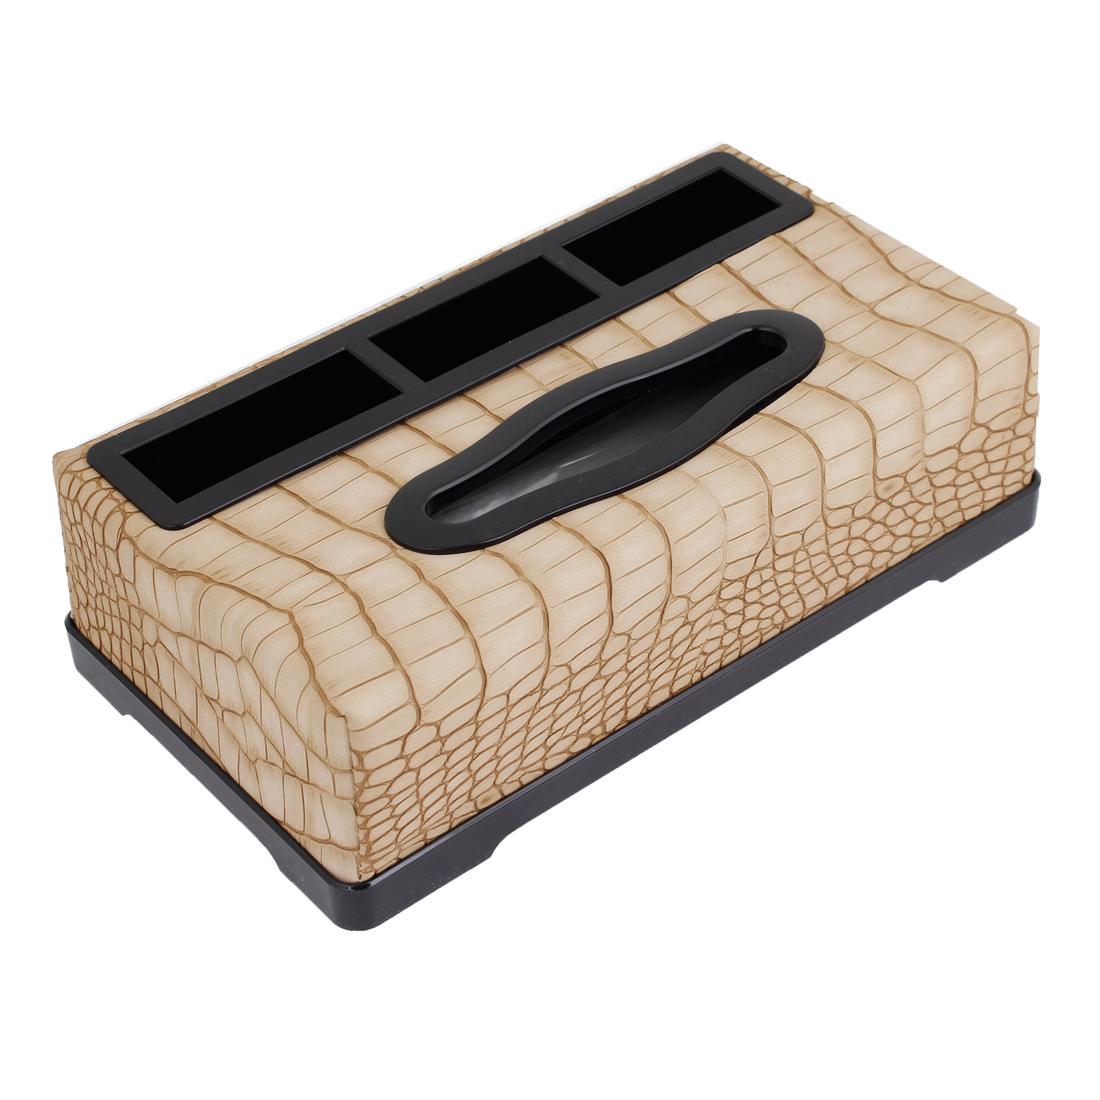 Auto Khaki Plastic Shell Crocodile Pattern Paper Tissue Box Case Holder